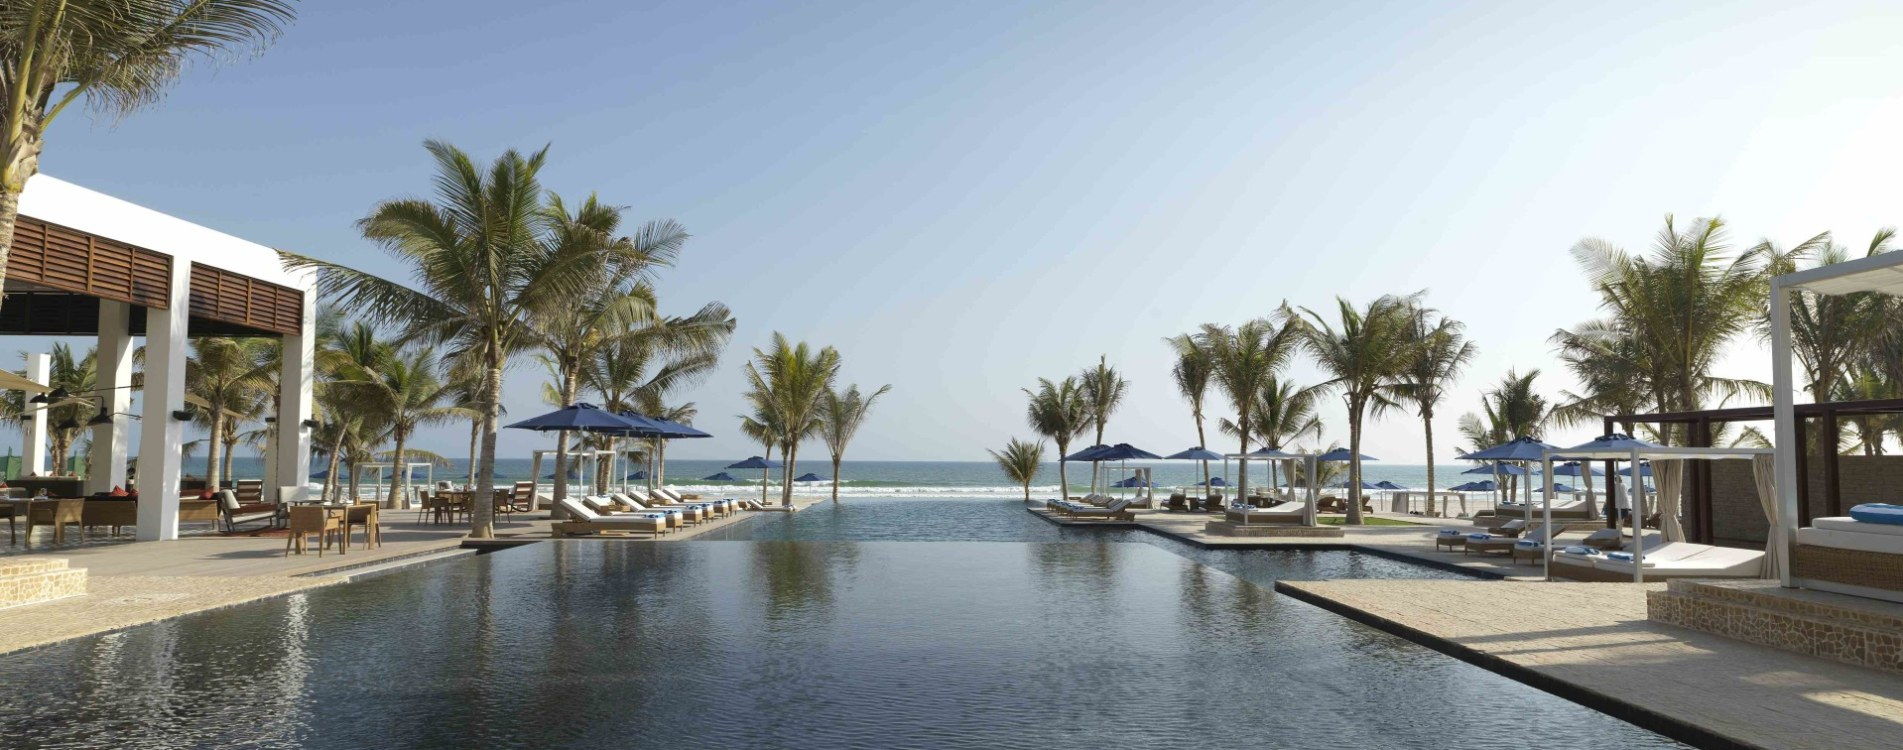 Al-Baleed-Resort-Salalah-By-Anantara-Infinity-Pool-Außenbereich-Oman.jpg